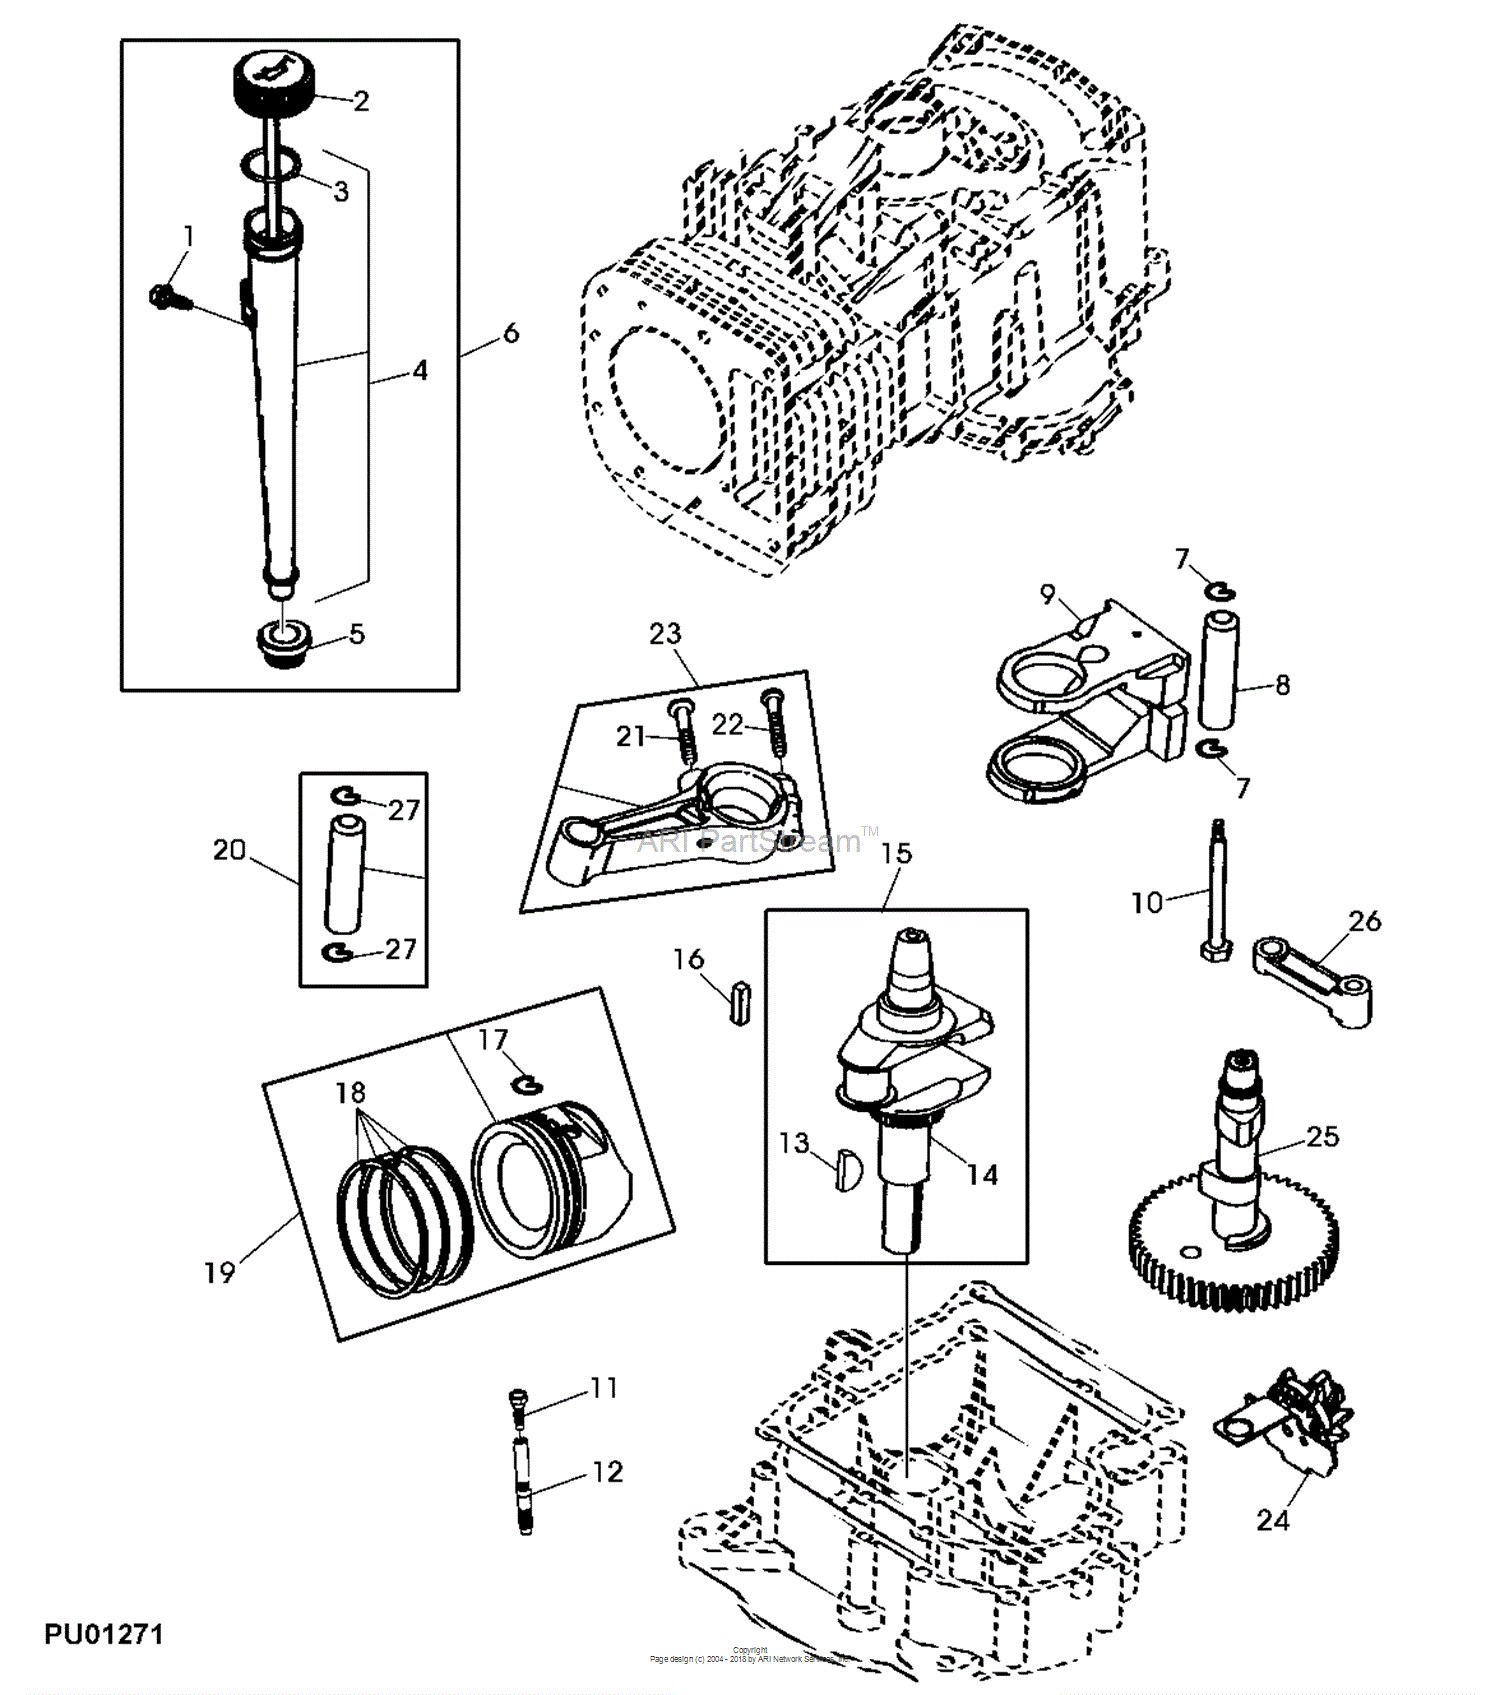 Piston Parts Diagram John Deere Parts Diagrams John Deere Sabre 1438 Lawn Tractor Of Piston Parts Diagram